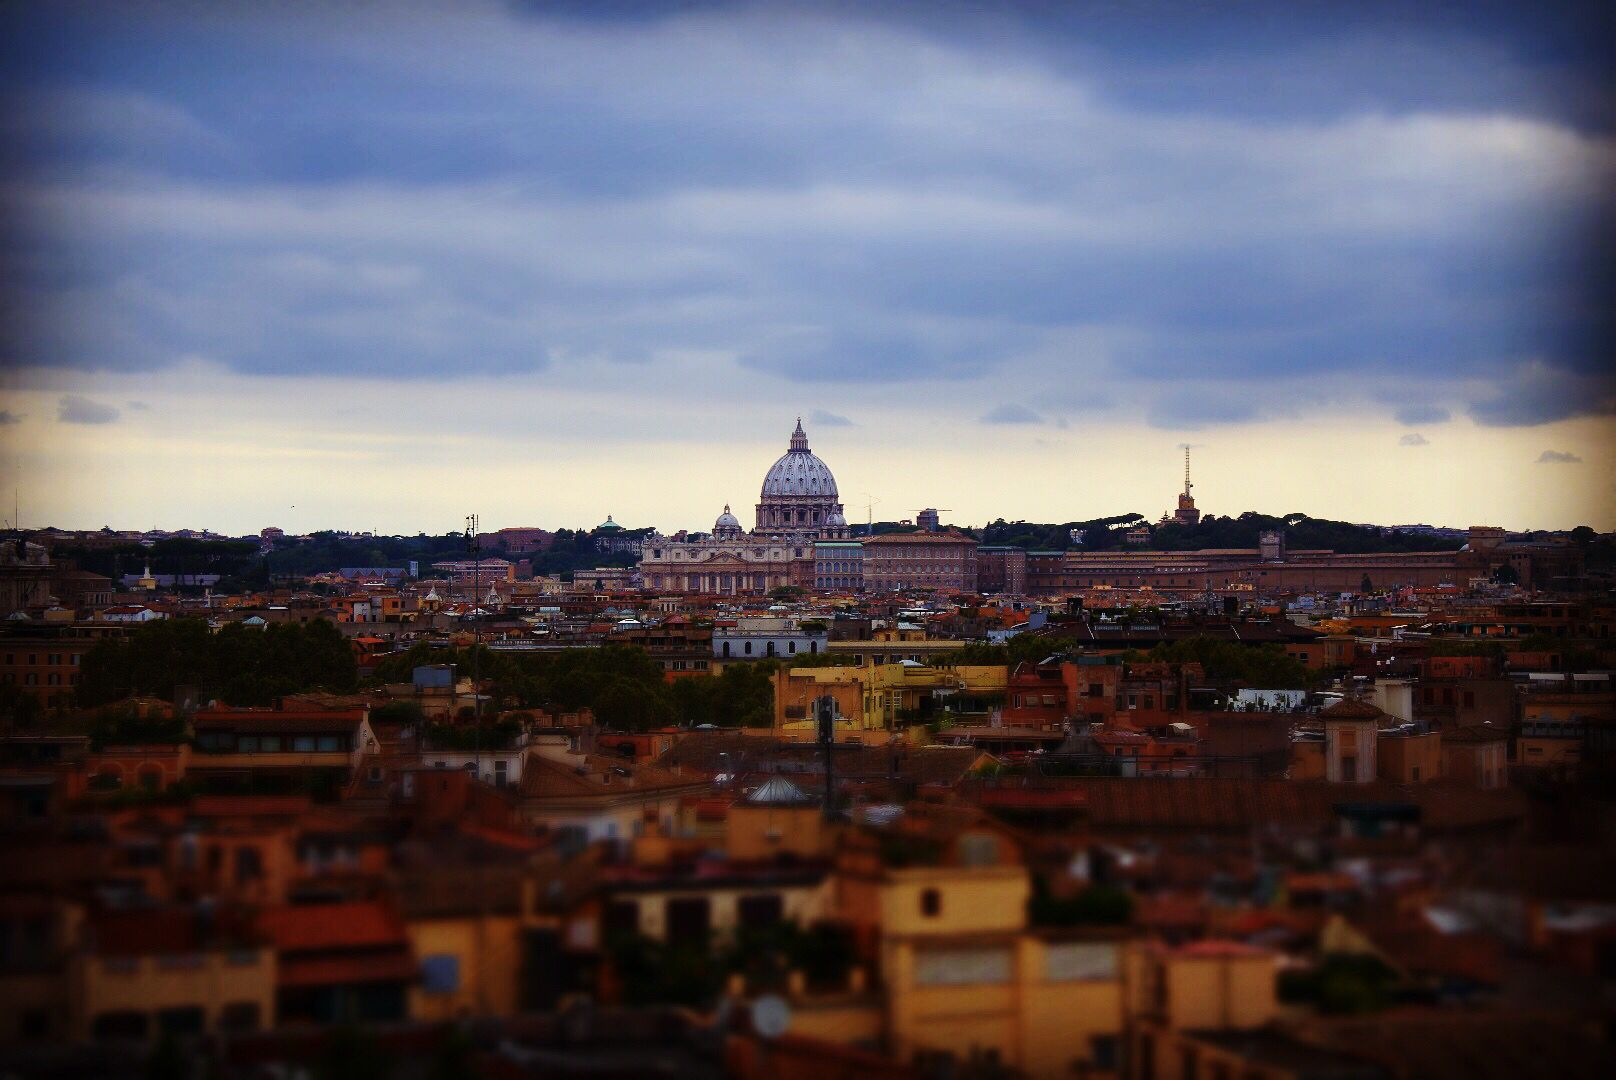 a1d9a3f88d03b1096933ae85863d6b38 - Barberini Gardens Of The Pontifical Villas